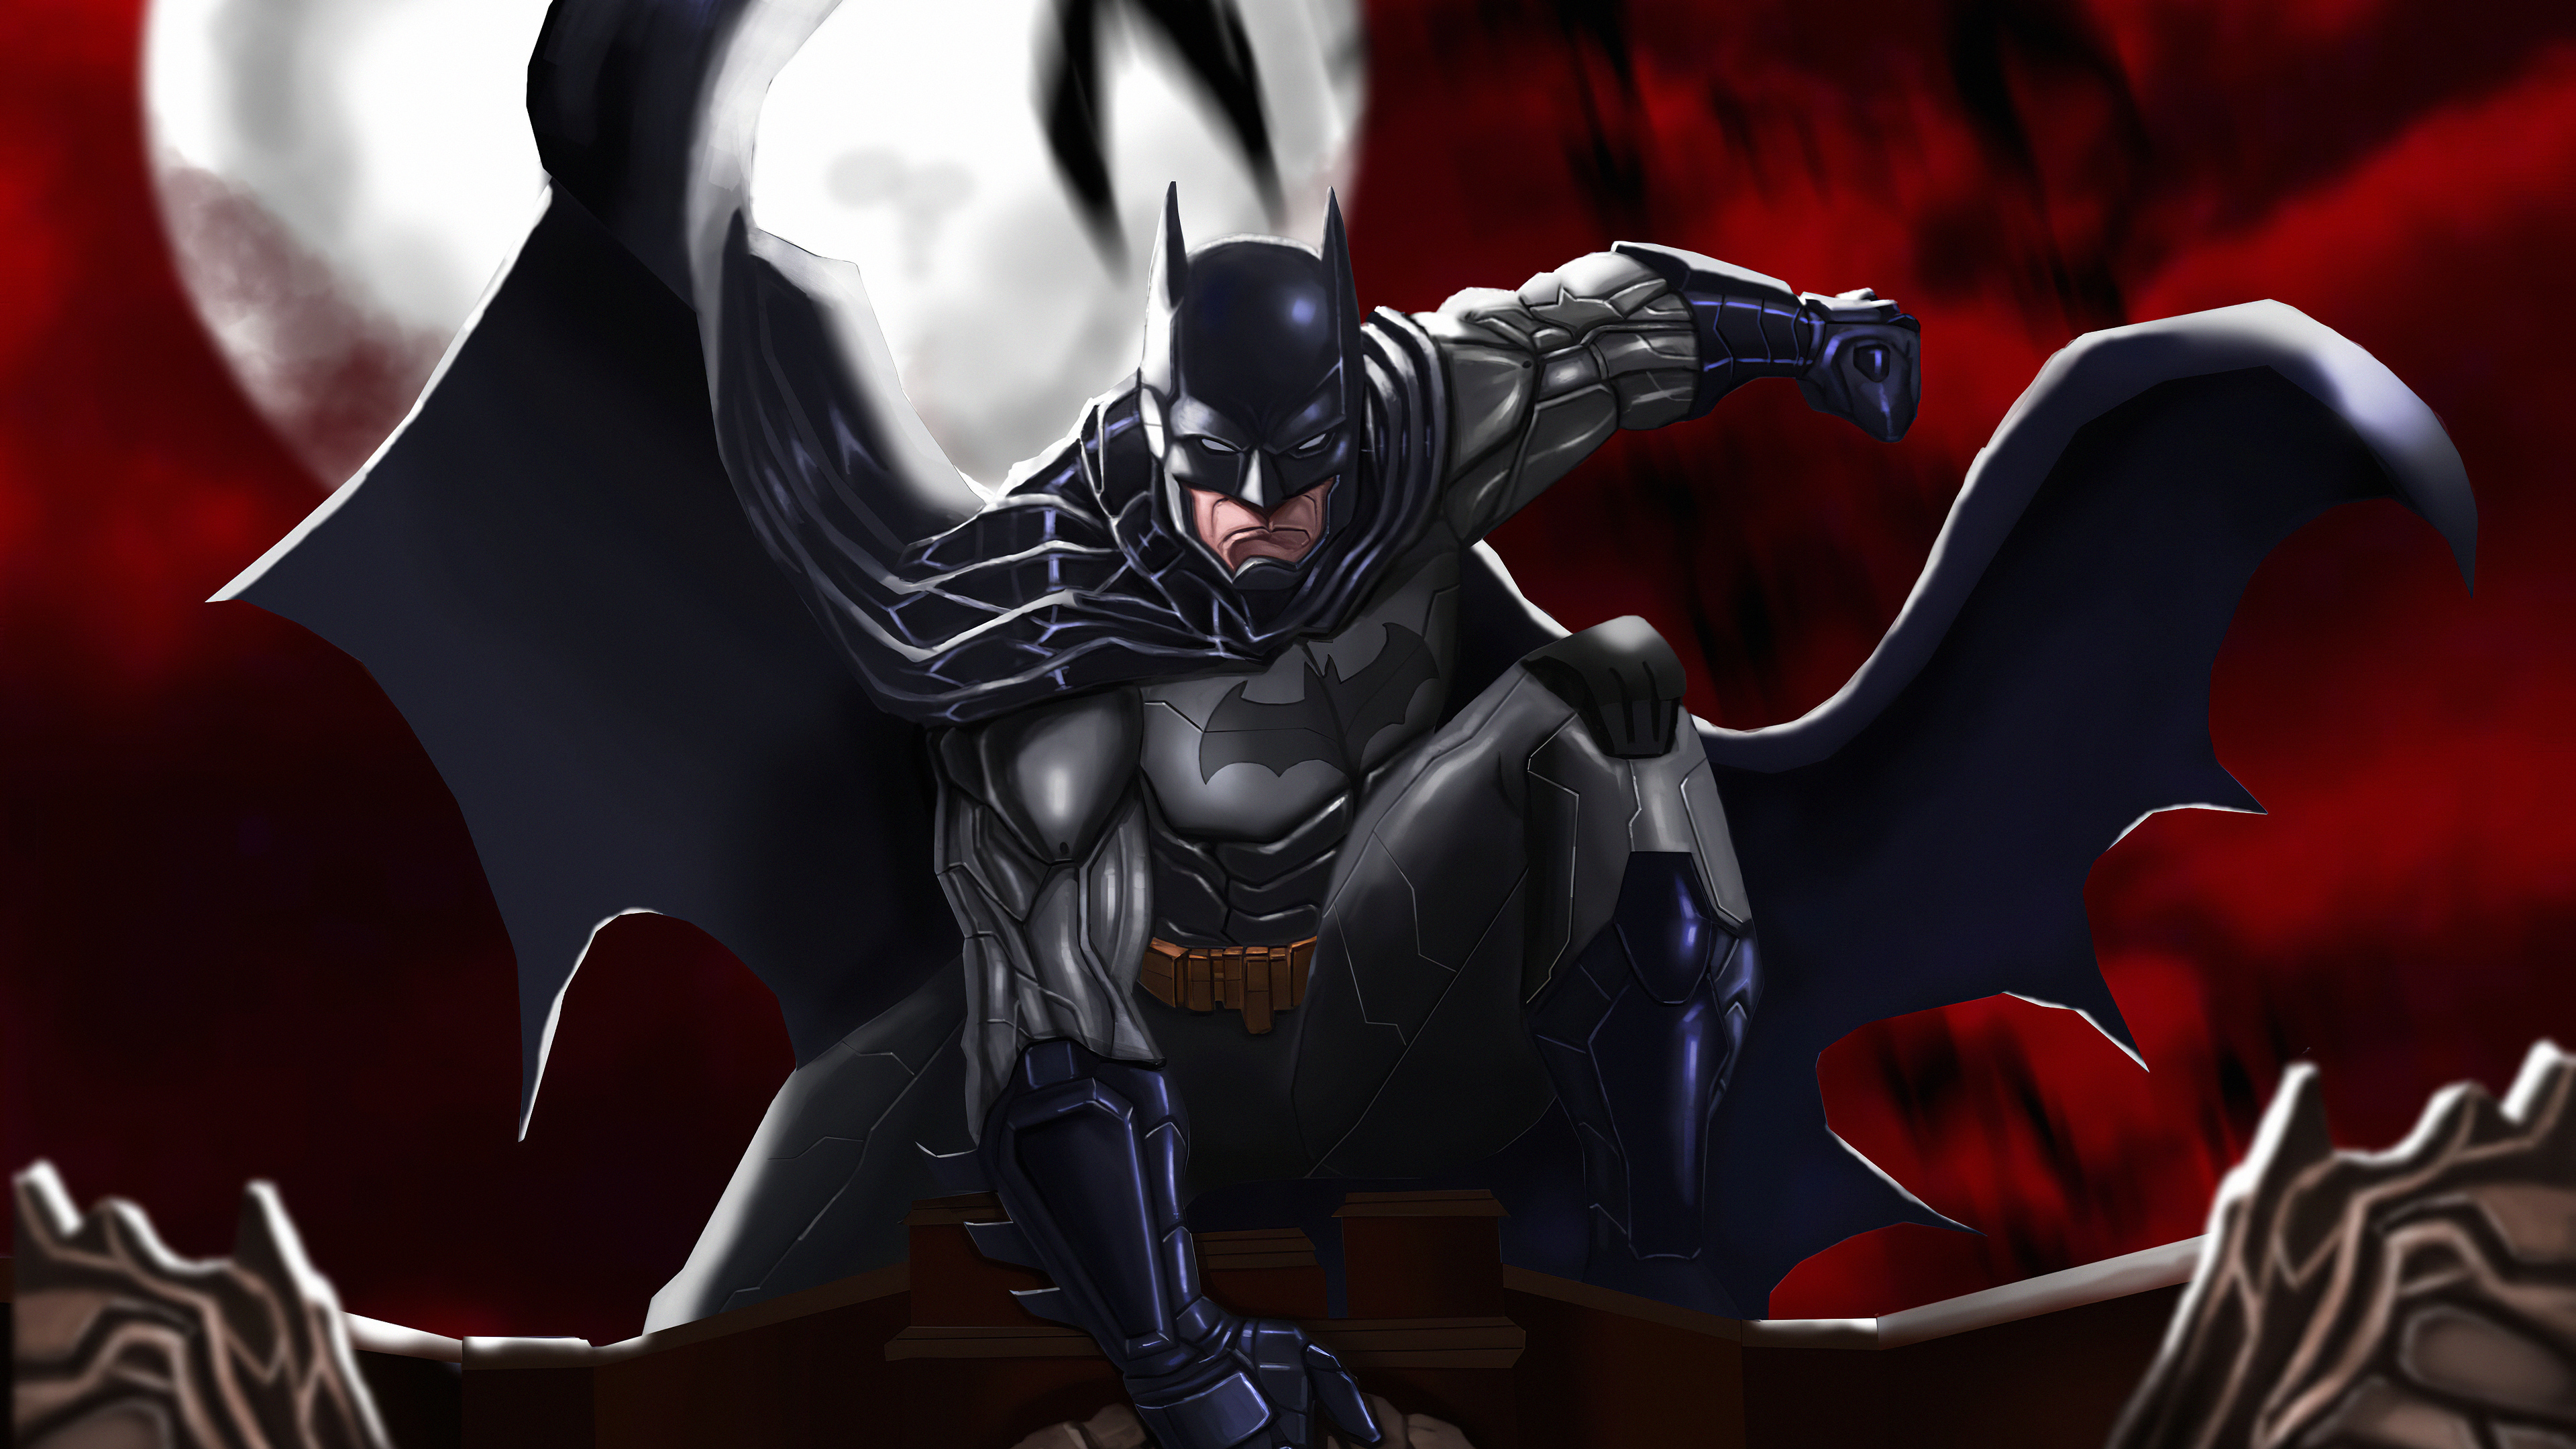 Batman 4k Artworknew, HD Superheroes, 4k Wallpapers ...